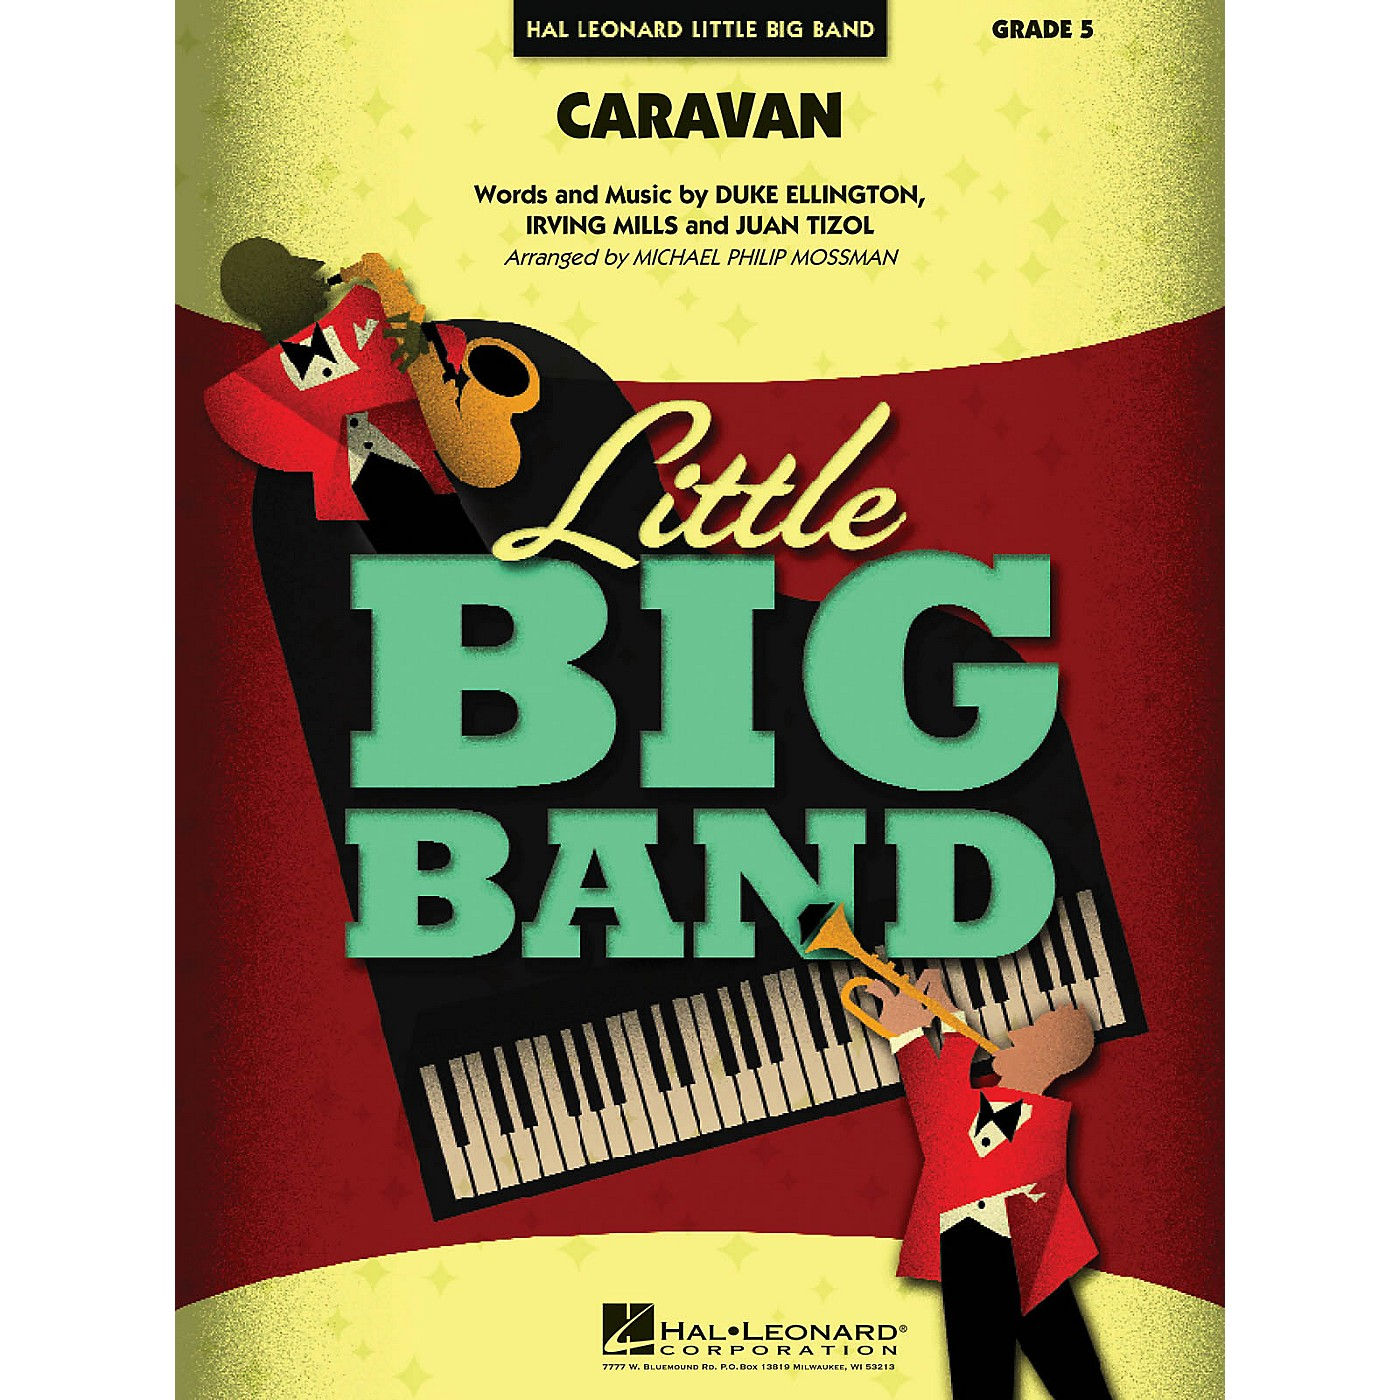 Hal Leonard Caravan Jazz Band Level 5 by Duke Ellington Arranged by Michael Philip Mossman thumbnail